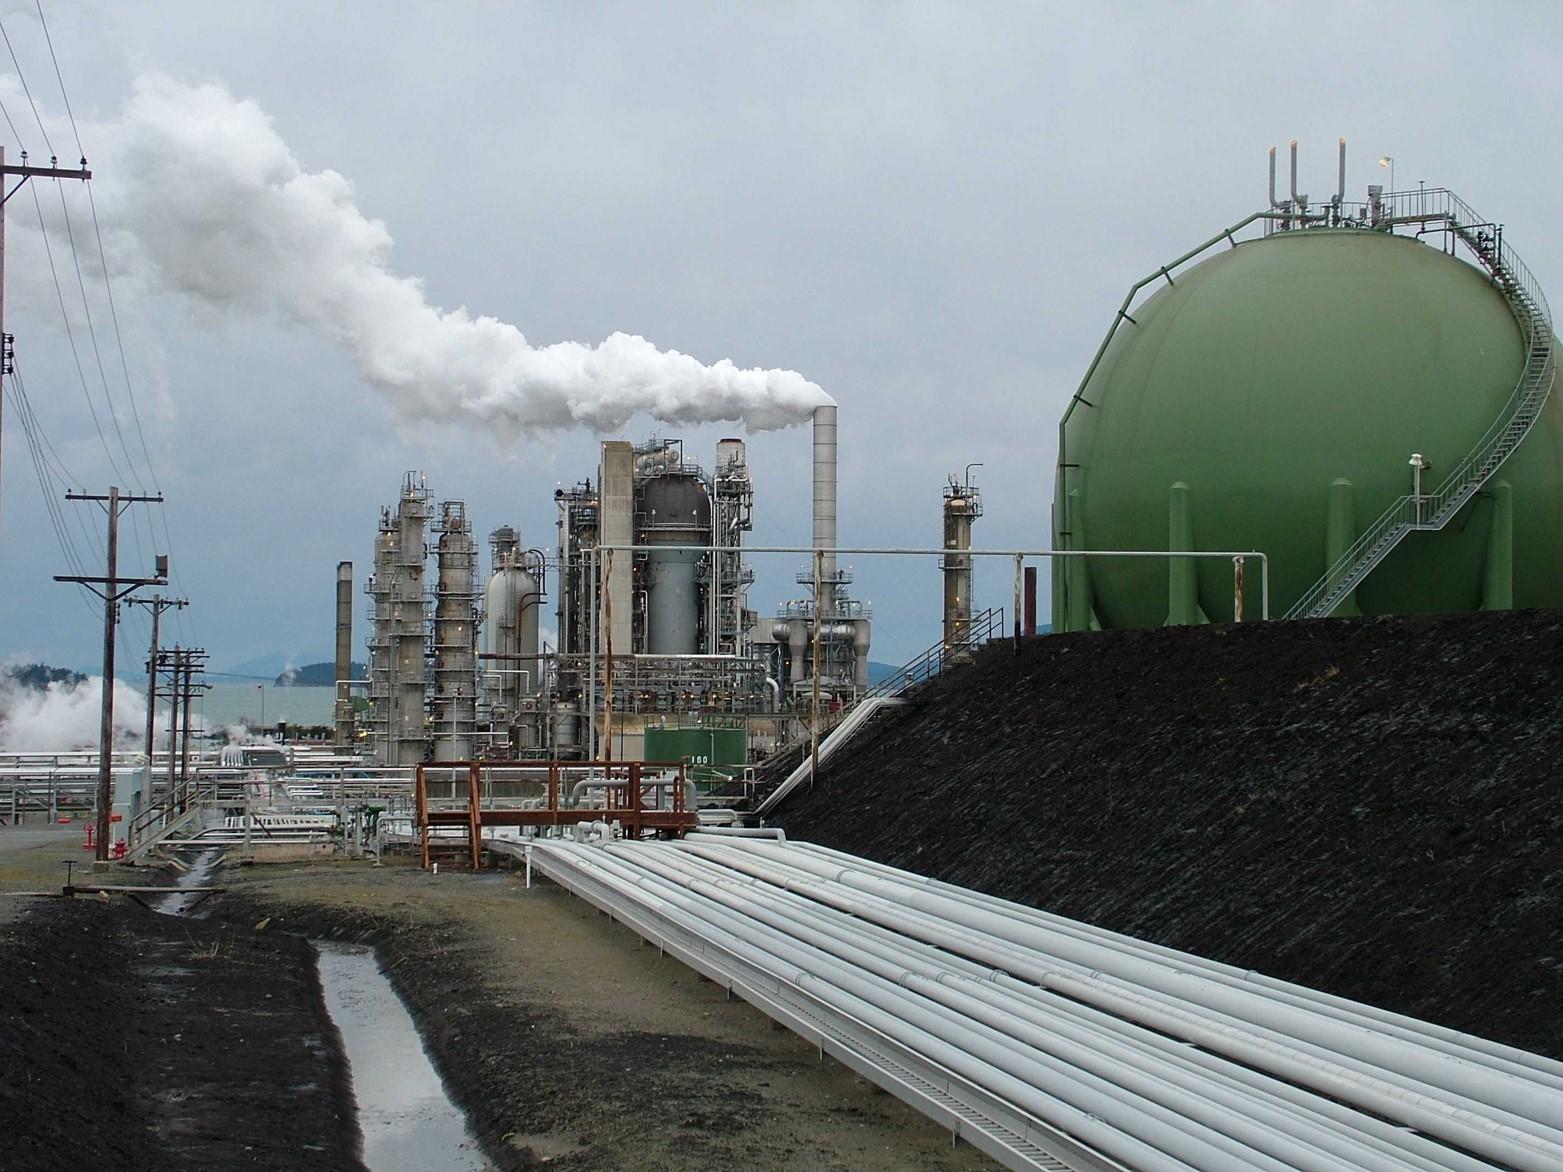 refinery-in-washington.jpg